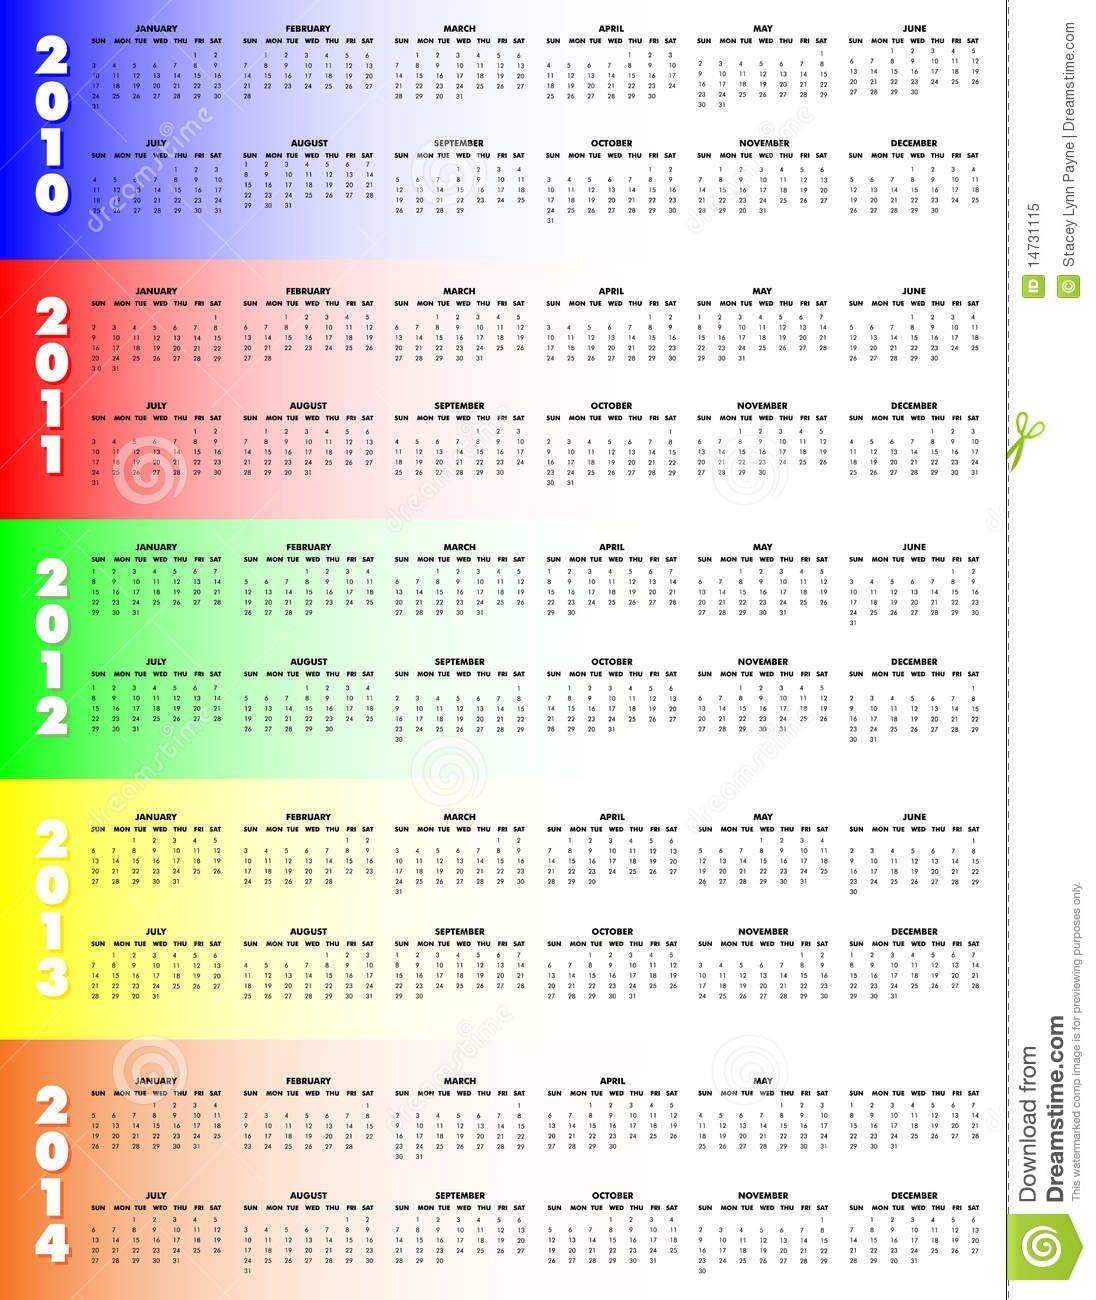 Five-Year Calendar 2010-2014 - Stock Vector - Illustration